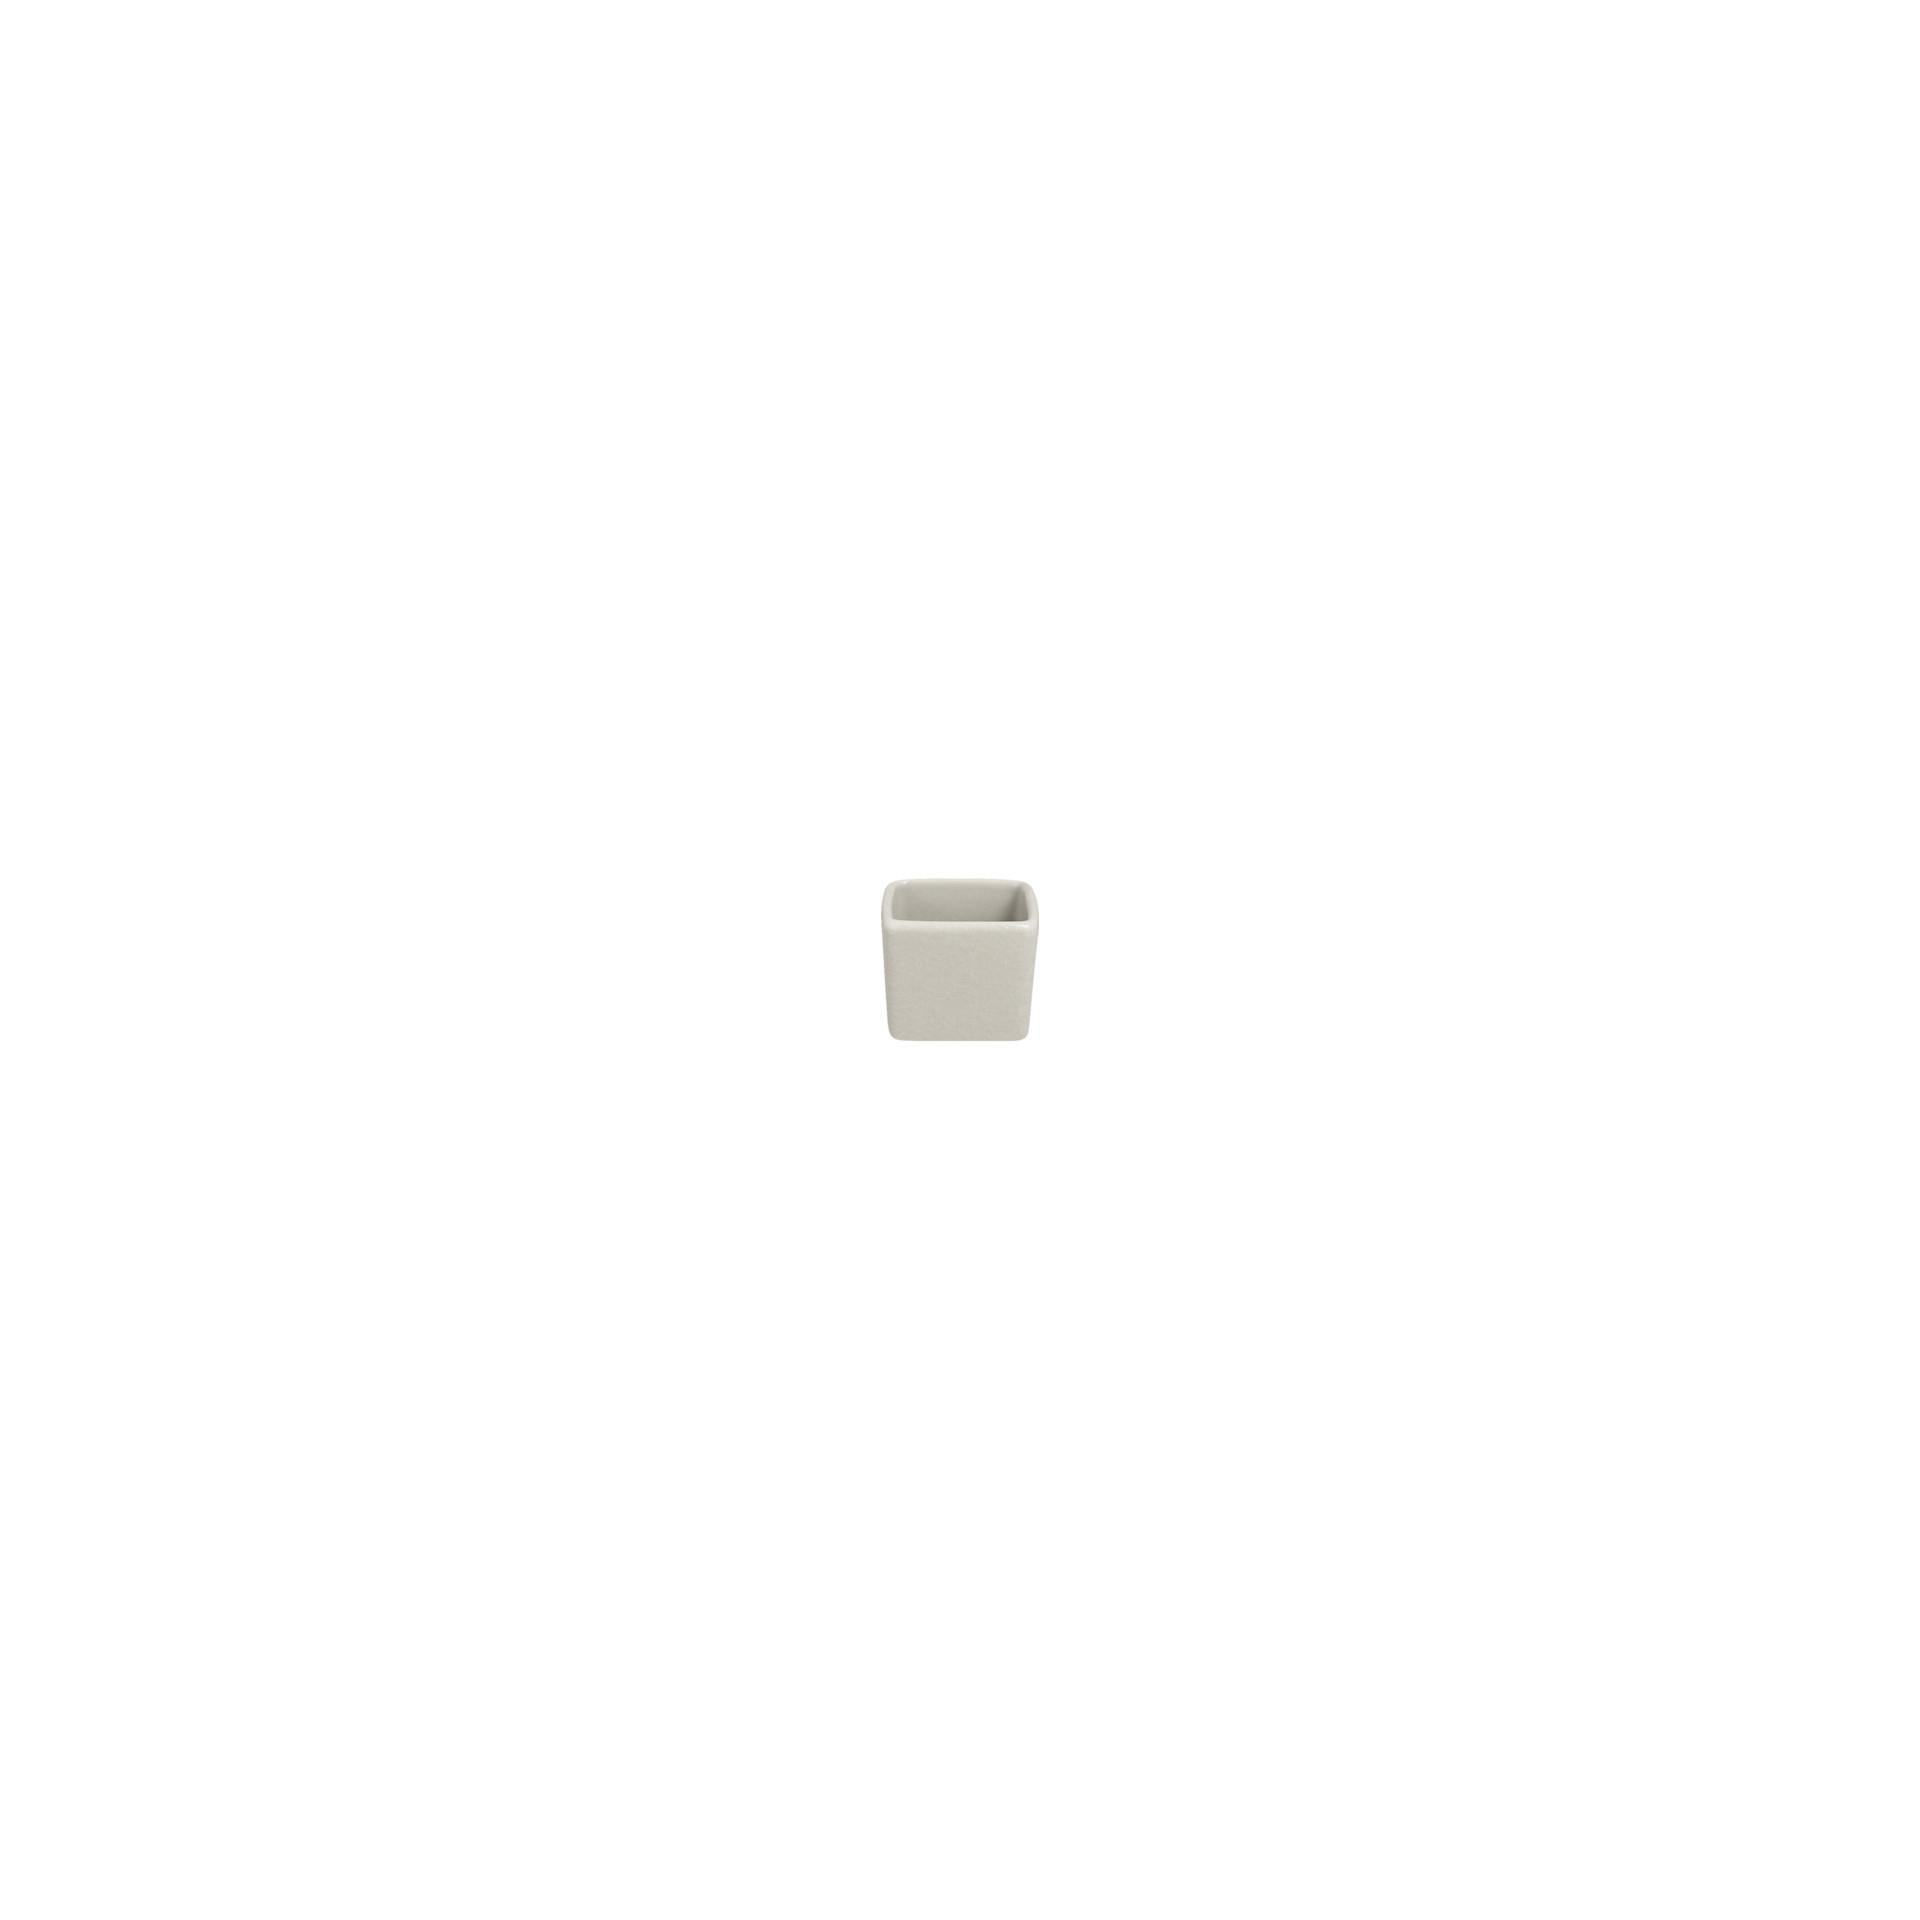 Neofusion, Kubus klein 50 x 50 x 45 mm / 0,06 l sand